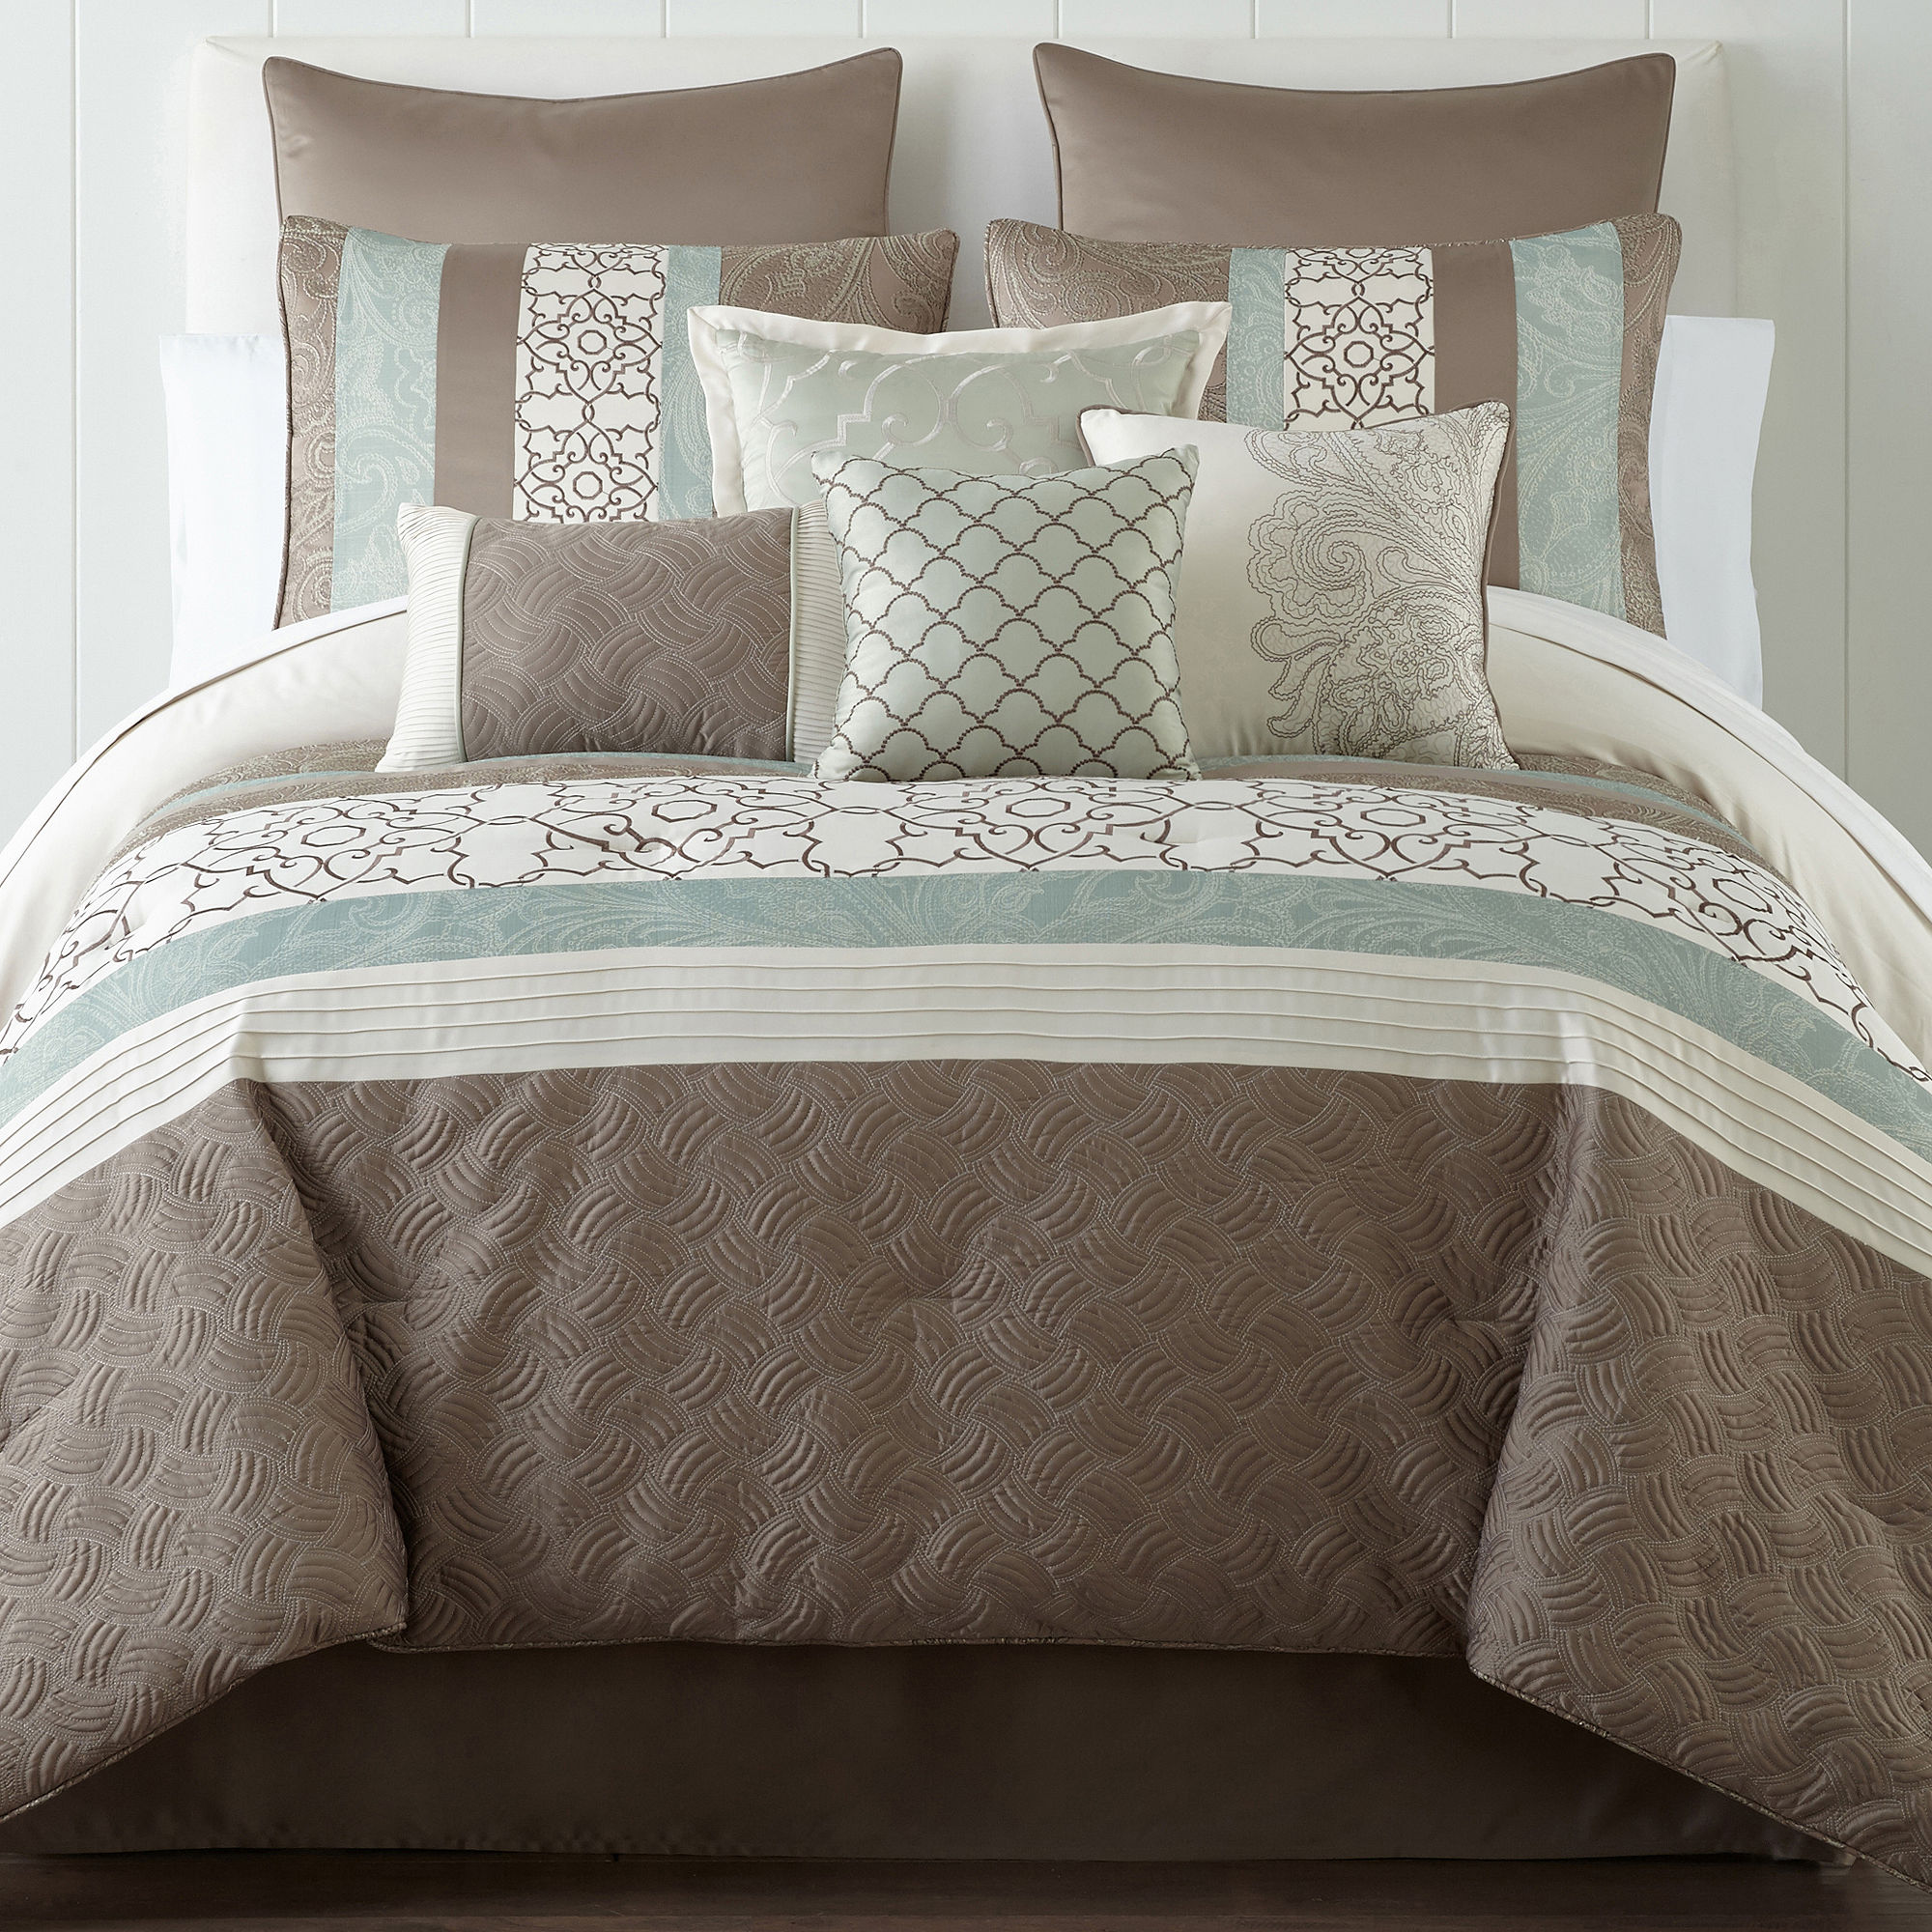 Deals Jcp Everyday Oxford Stripe Comforter Set Offer